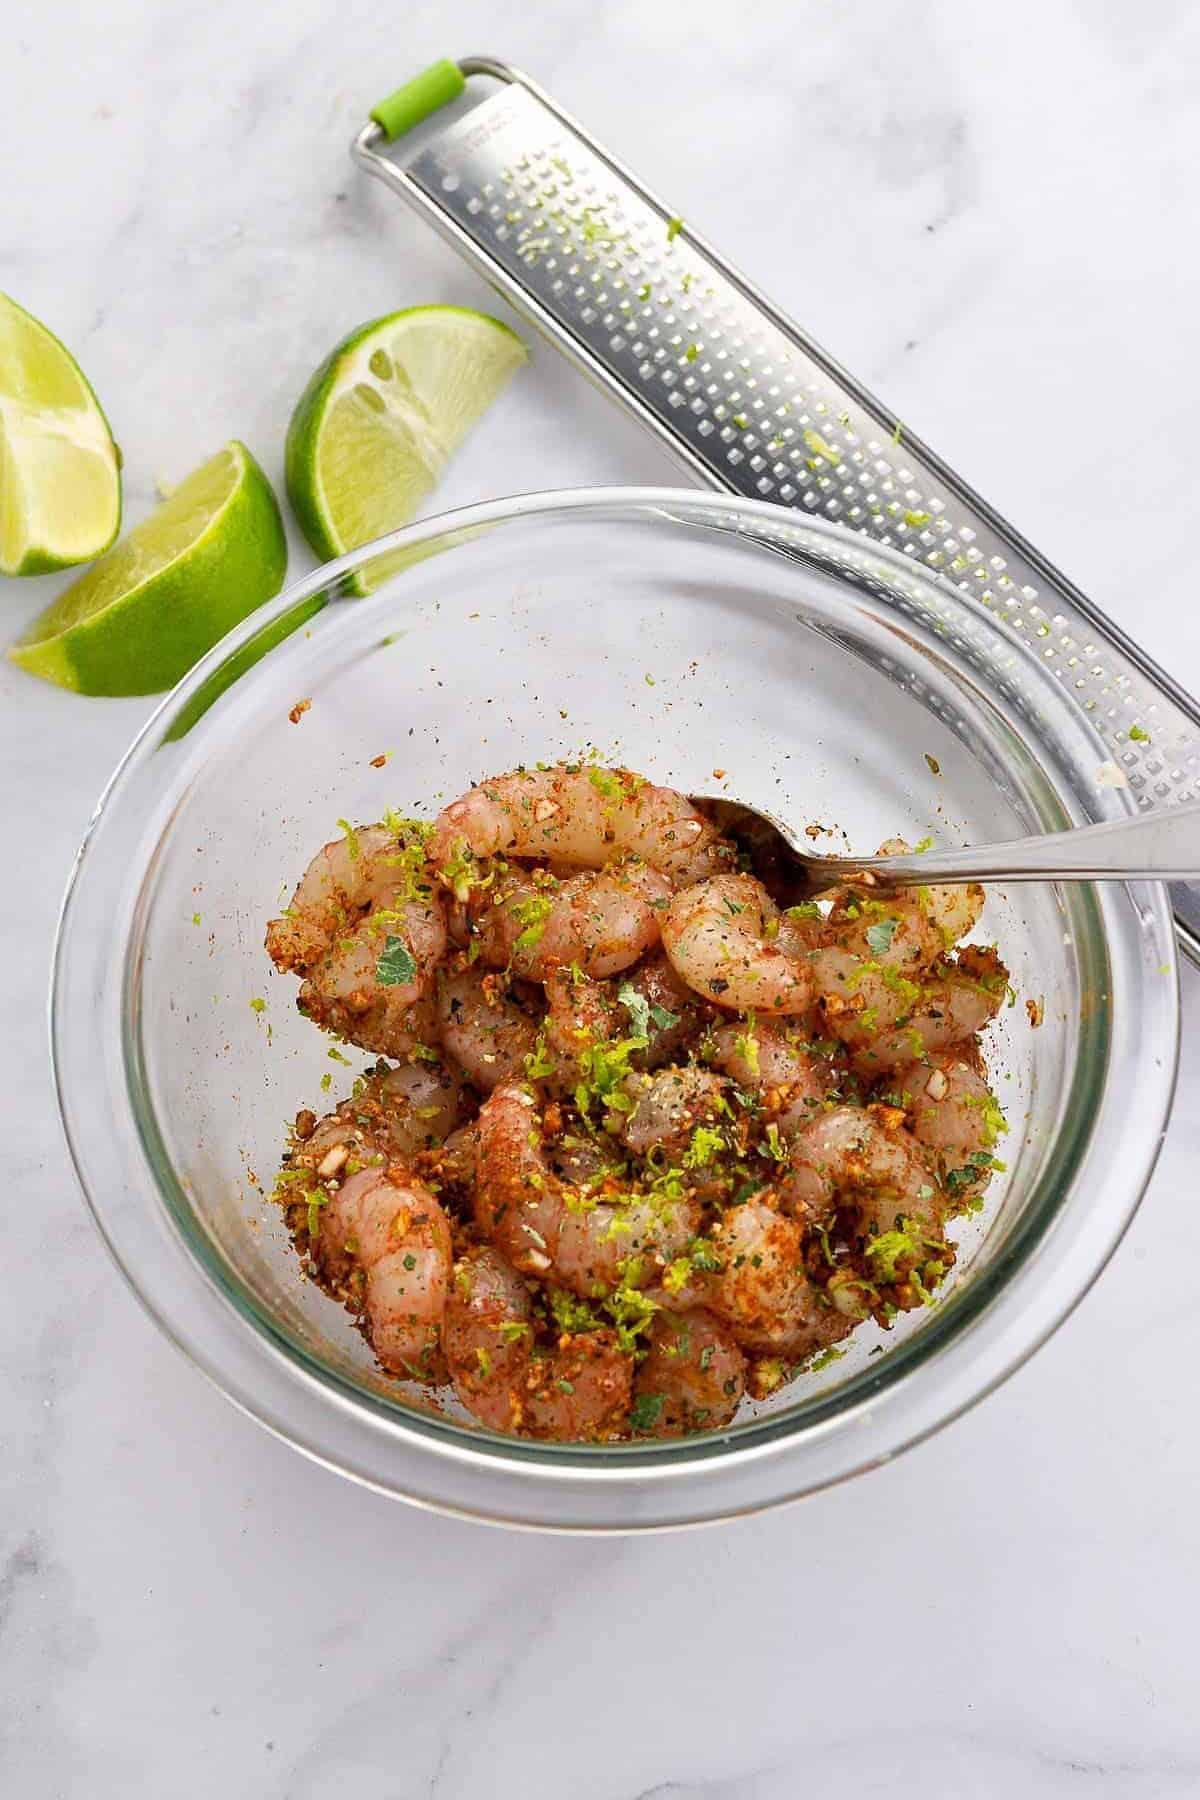 Tossing prawns or shrimp with Cajun spices for Shrimp Stuffed Avocado boats